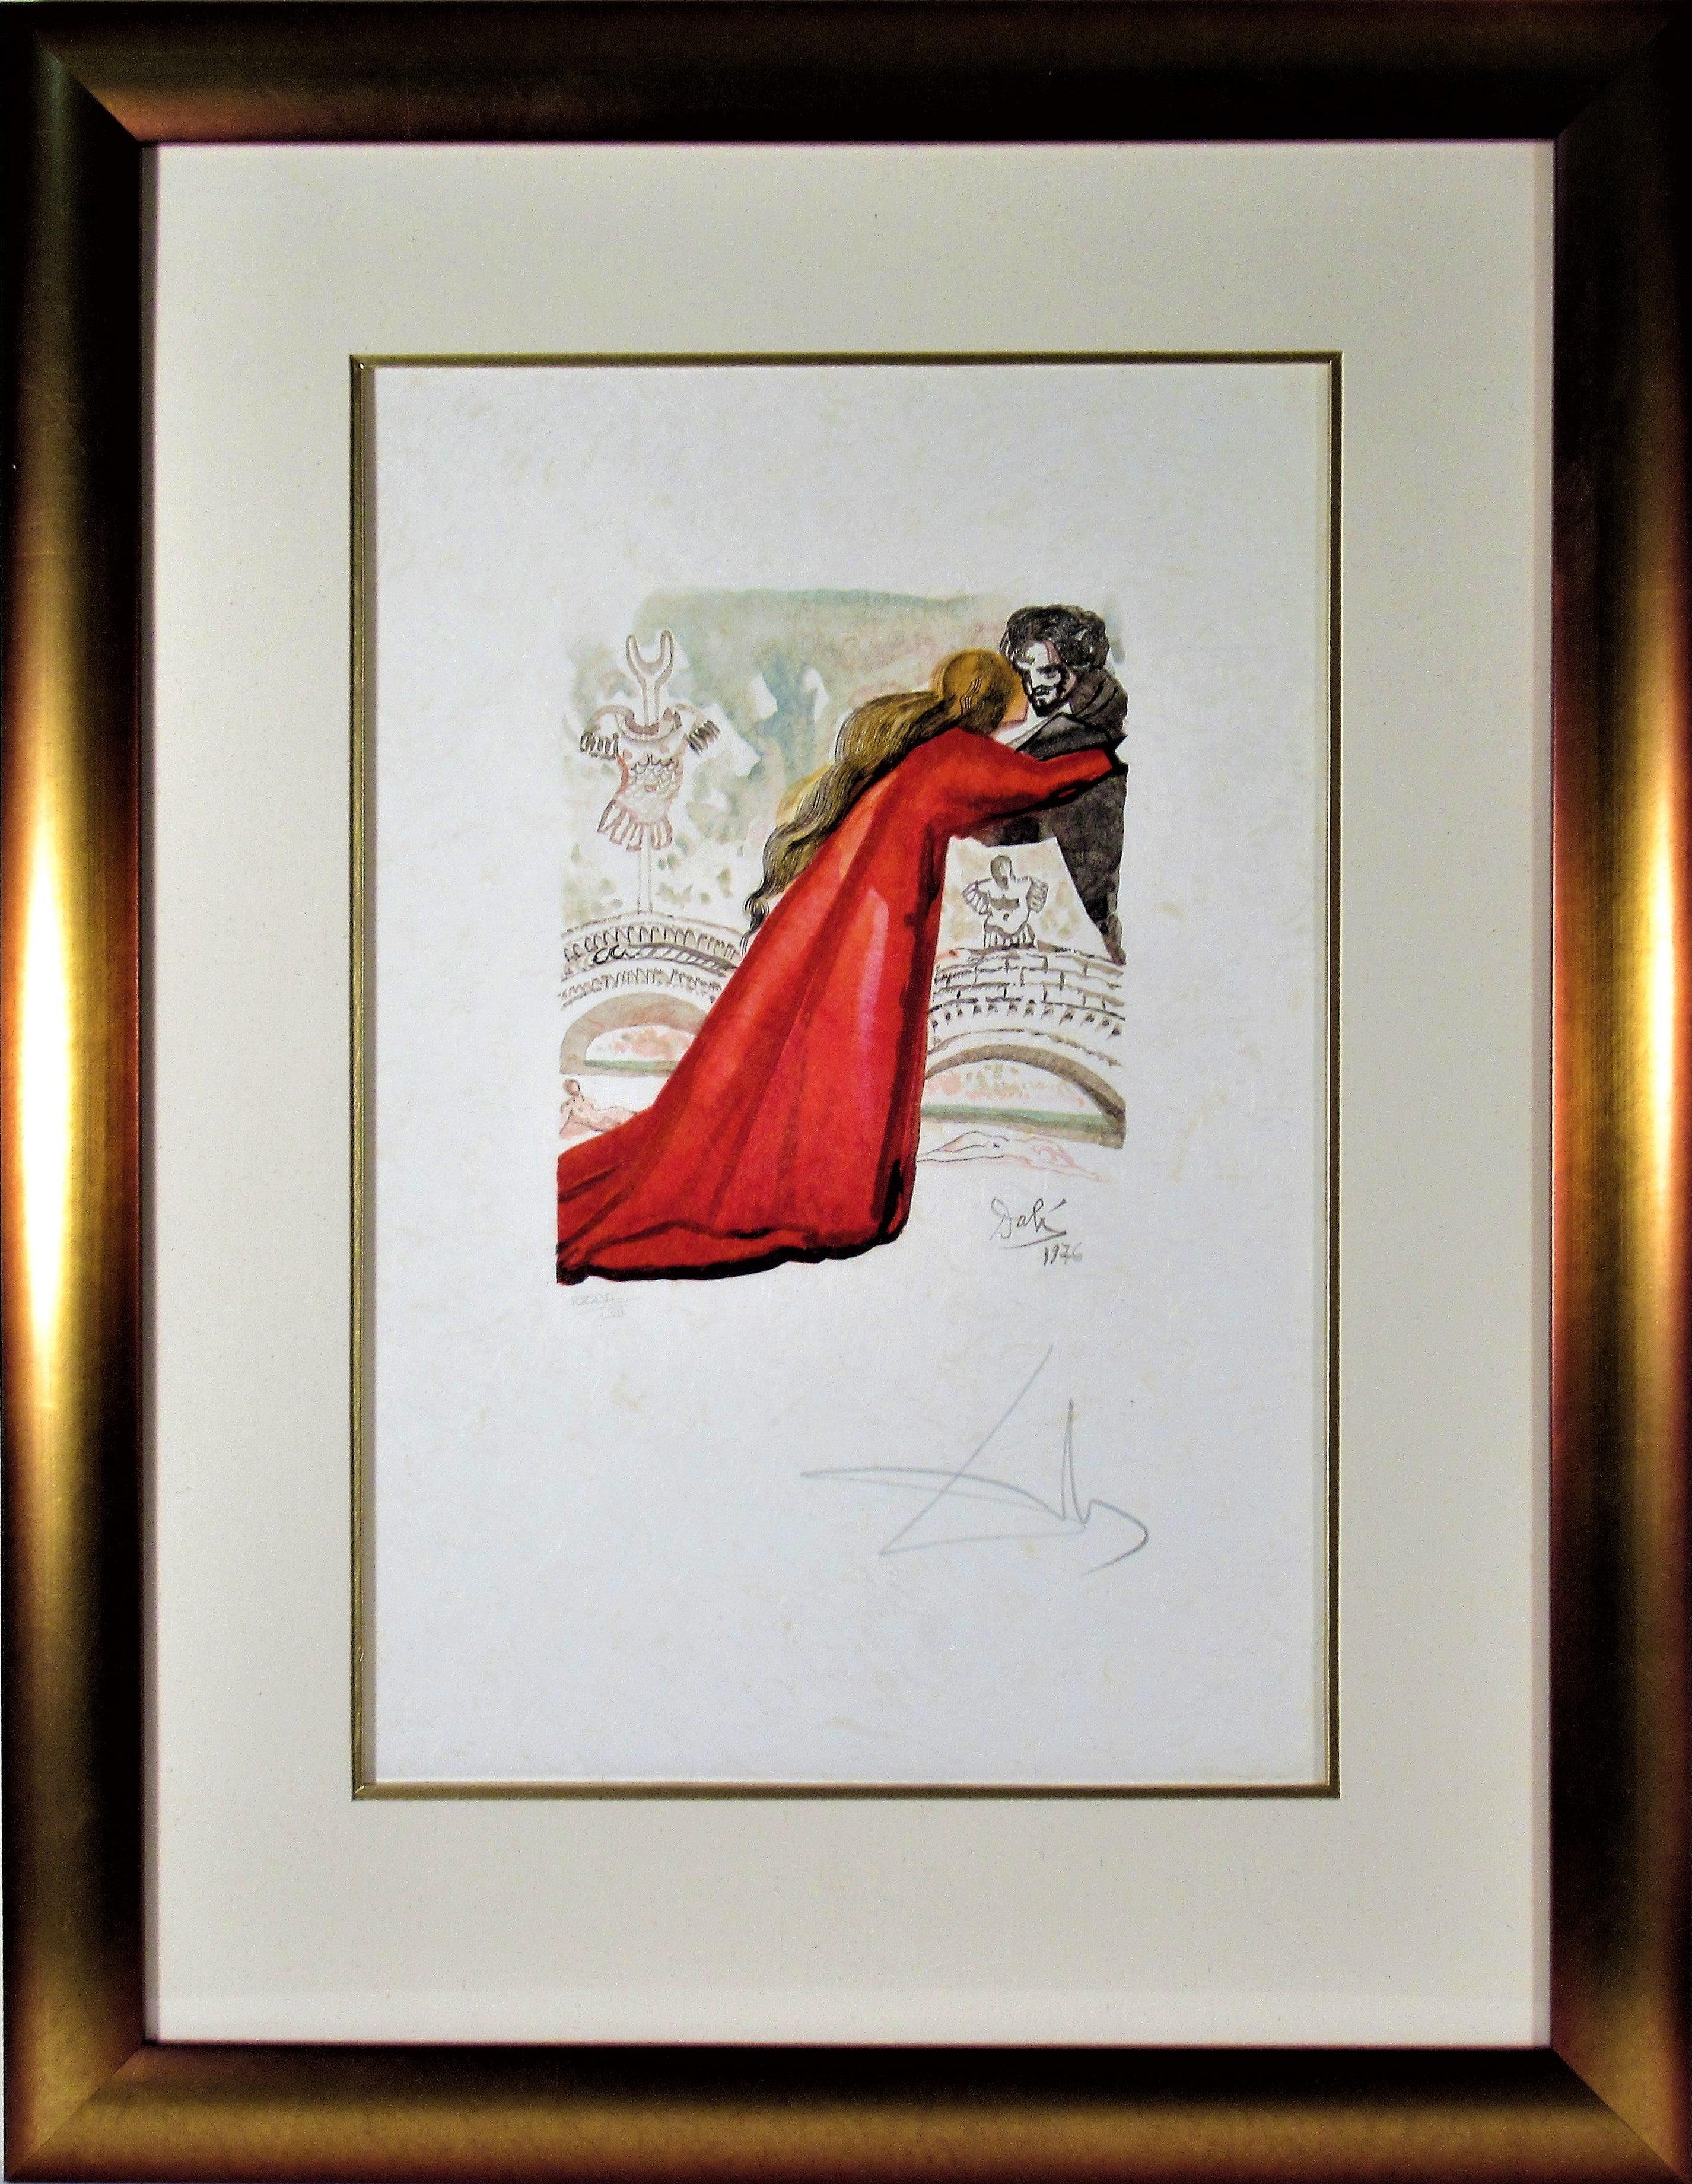 """Pilate Aimait Hermione"" from the suite ""l'Art d'Aimer d'Ovide"""